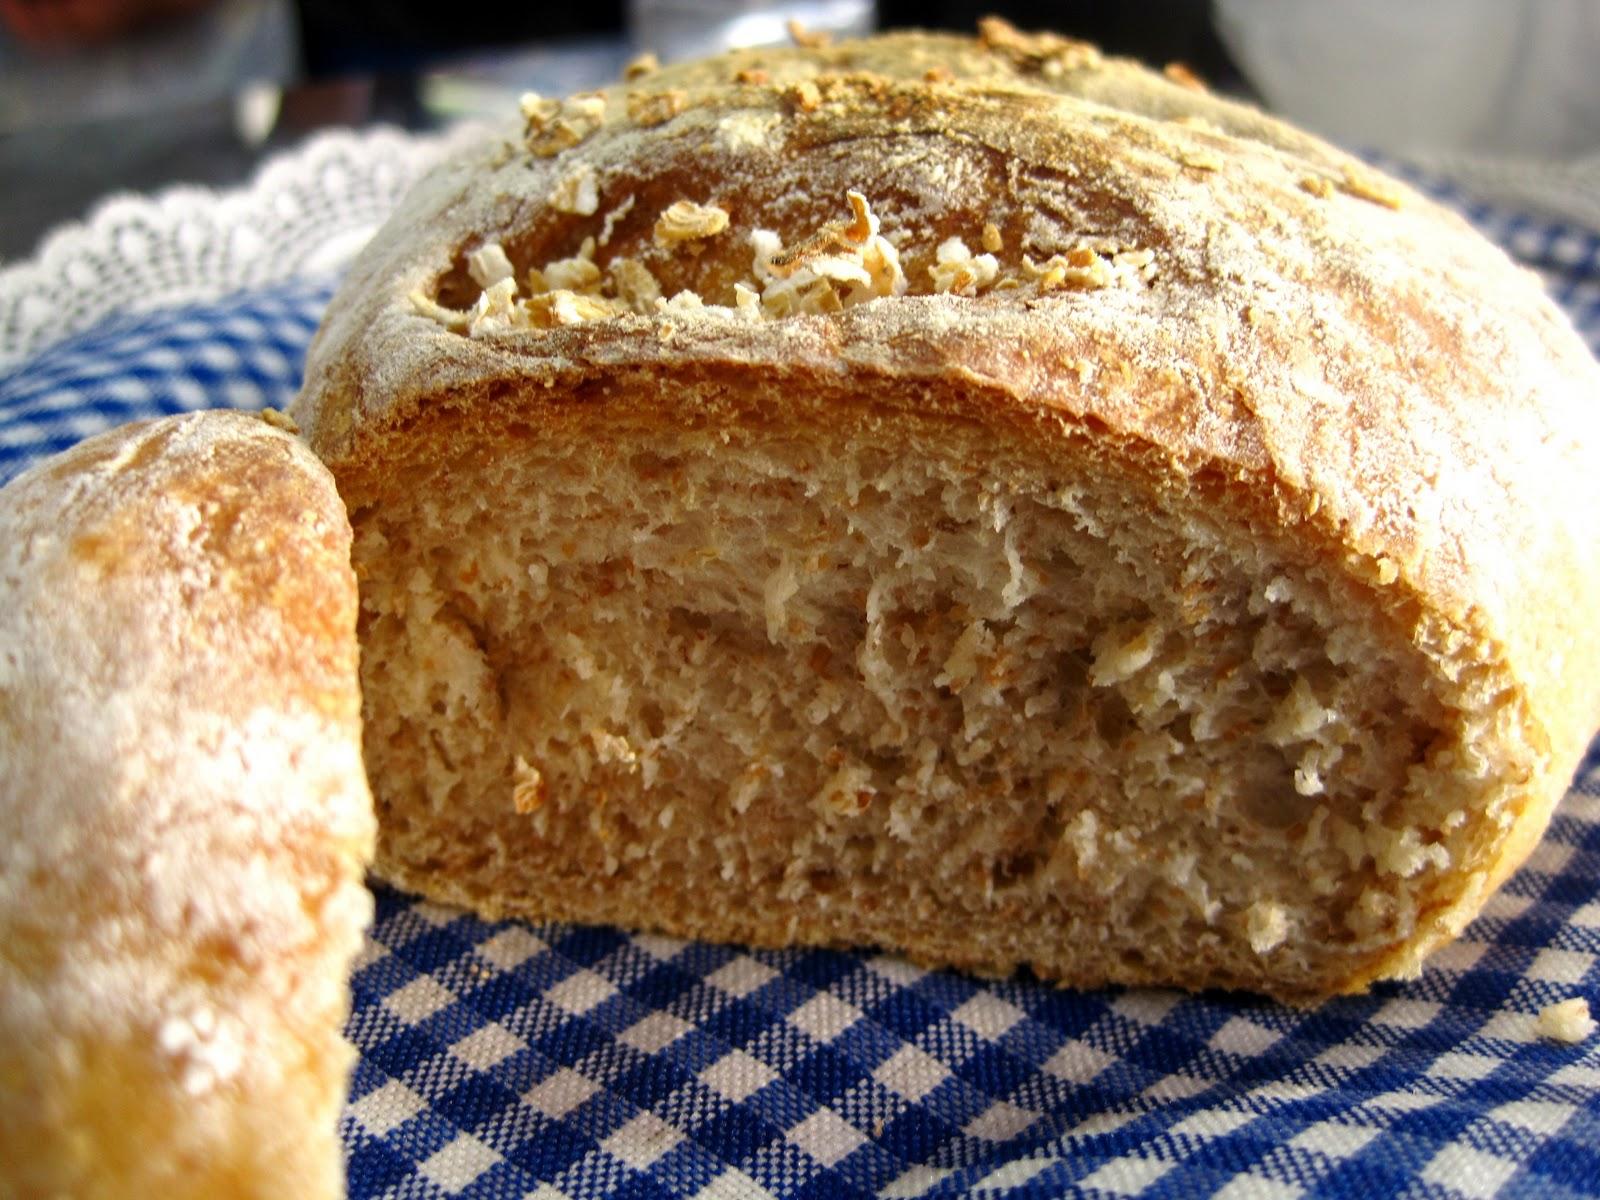 The Blue Cottage: Oatmeal Whole Wheat Bread